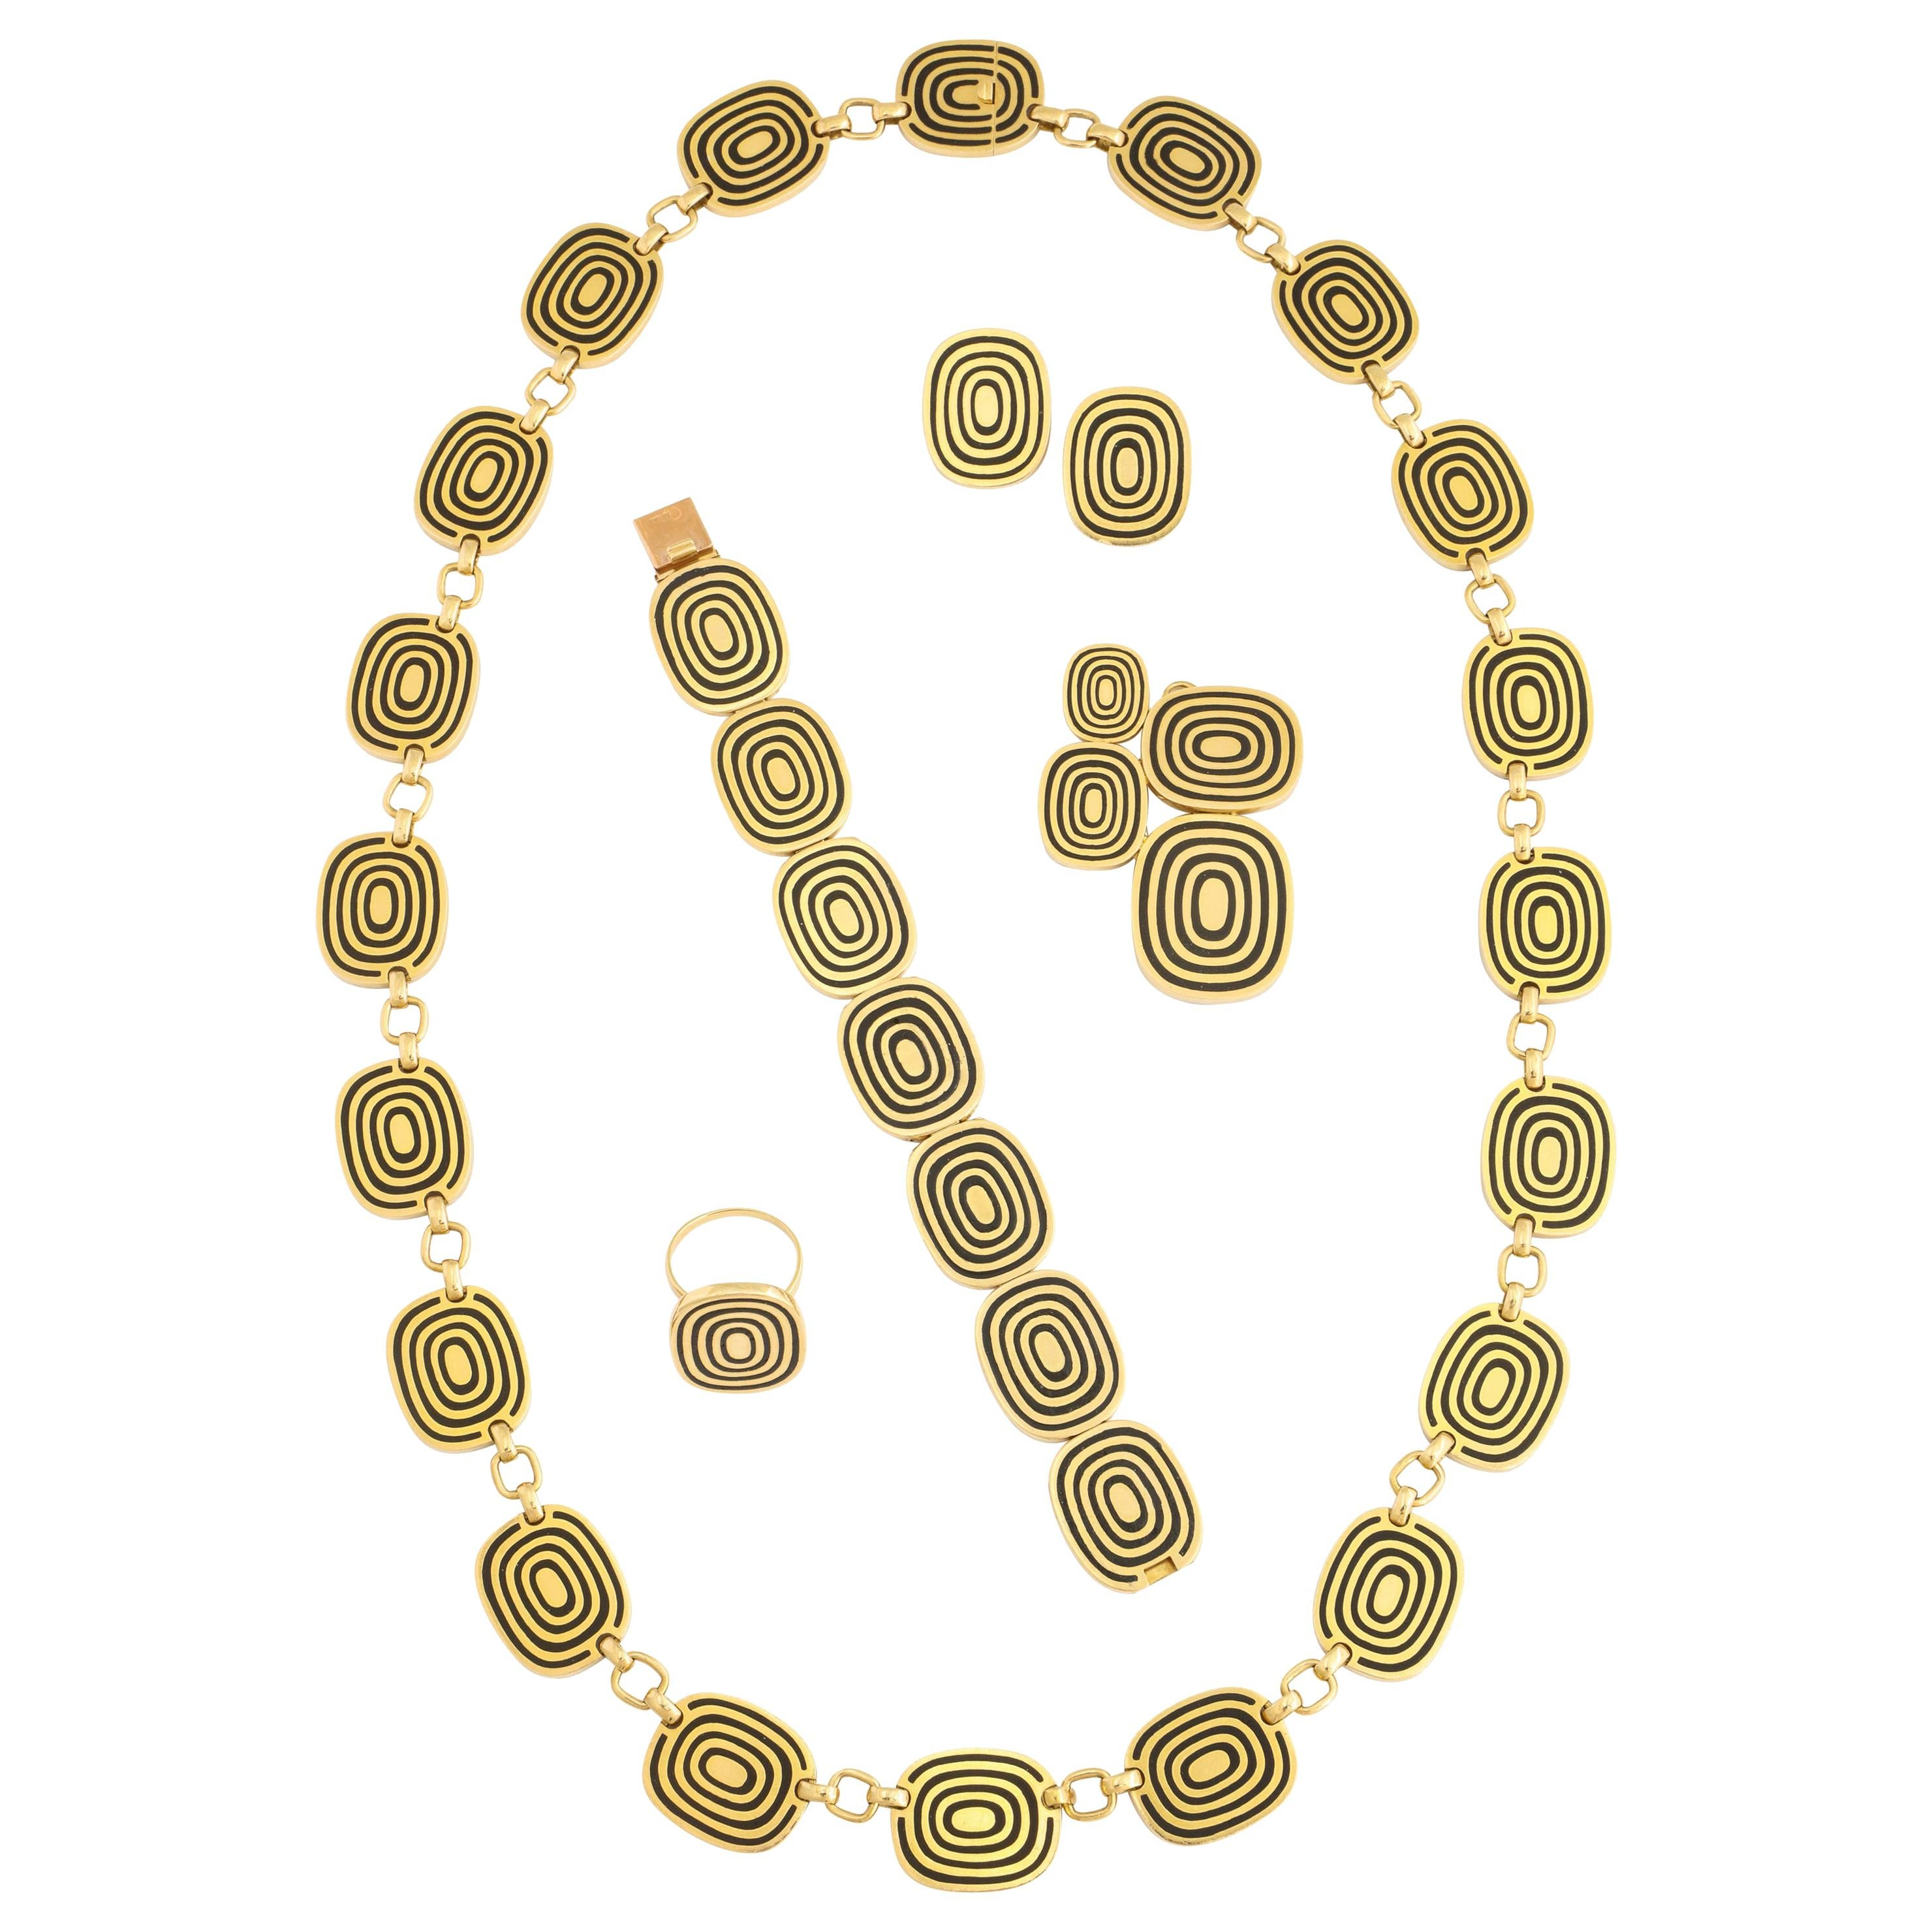 1960s Patek Phillipe Five Piece Modernist Gold Enamel Jewelry Suite